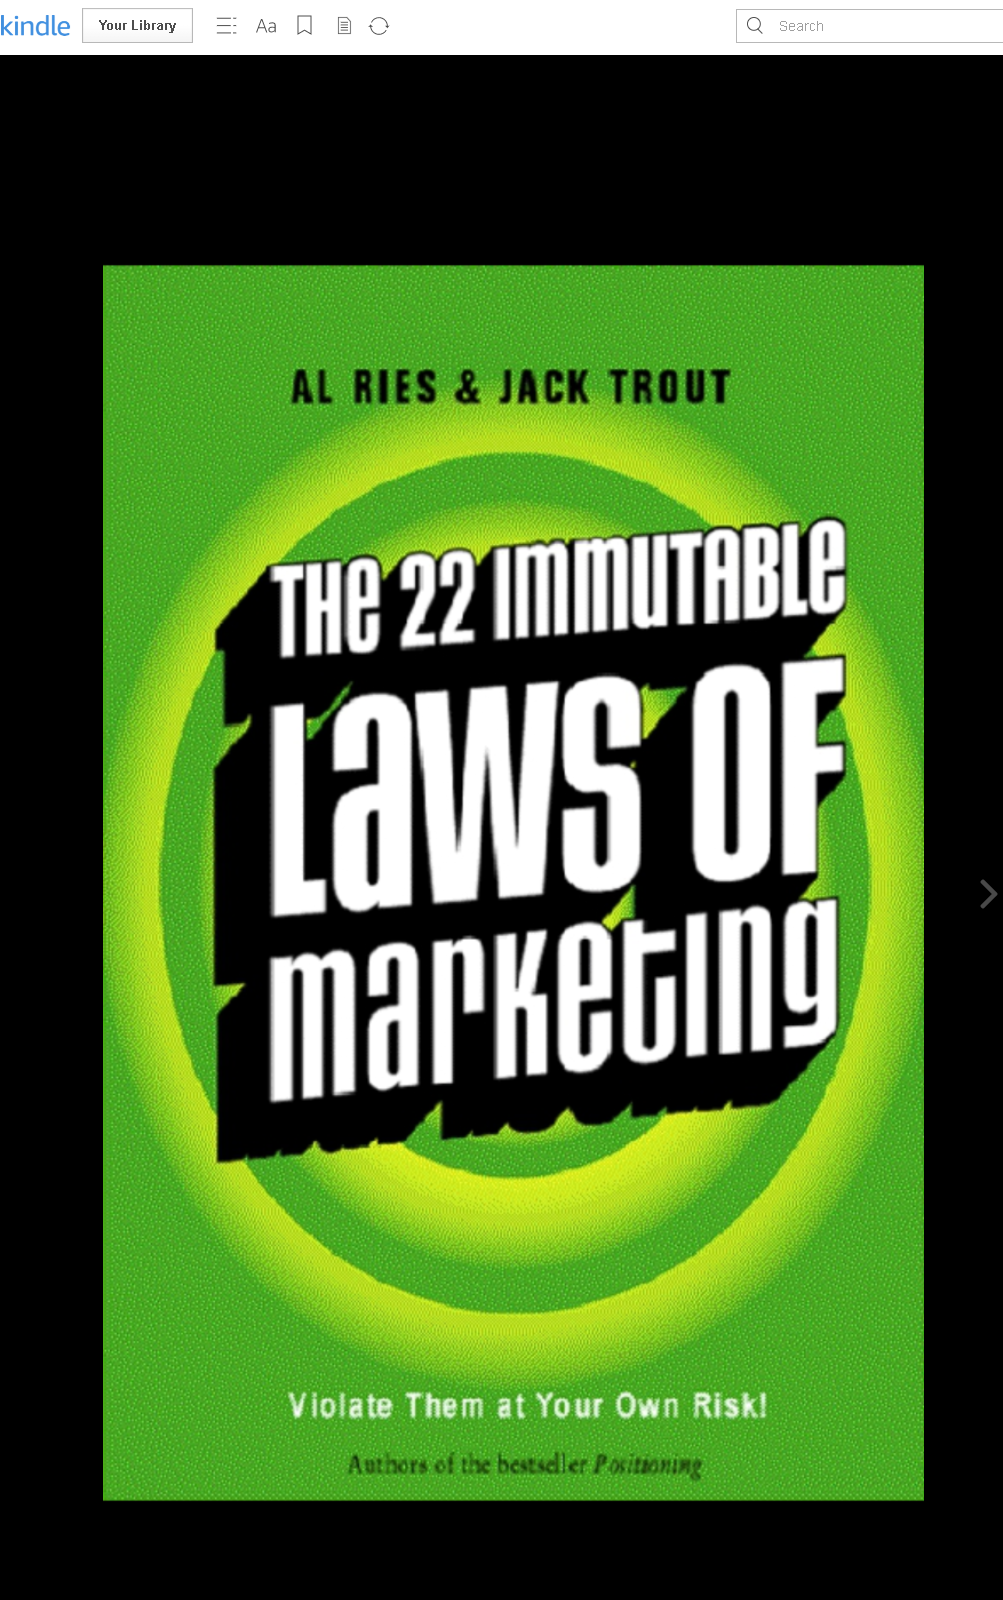 Review Buku The 22 Immutable Laws of Marketing karanga AL RIES & JACK TROUT